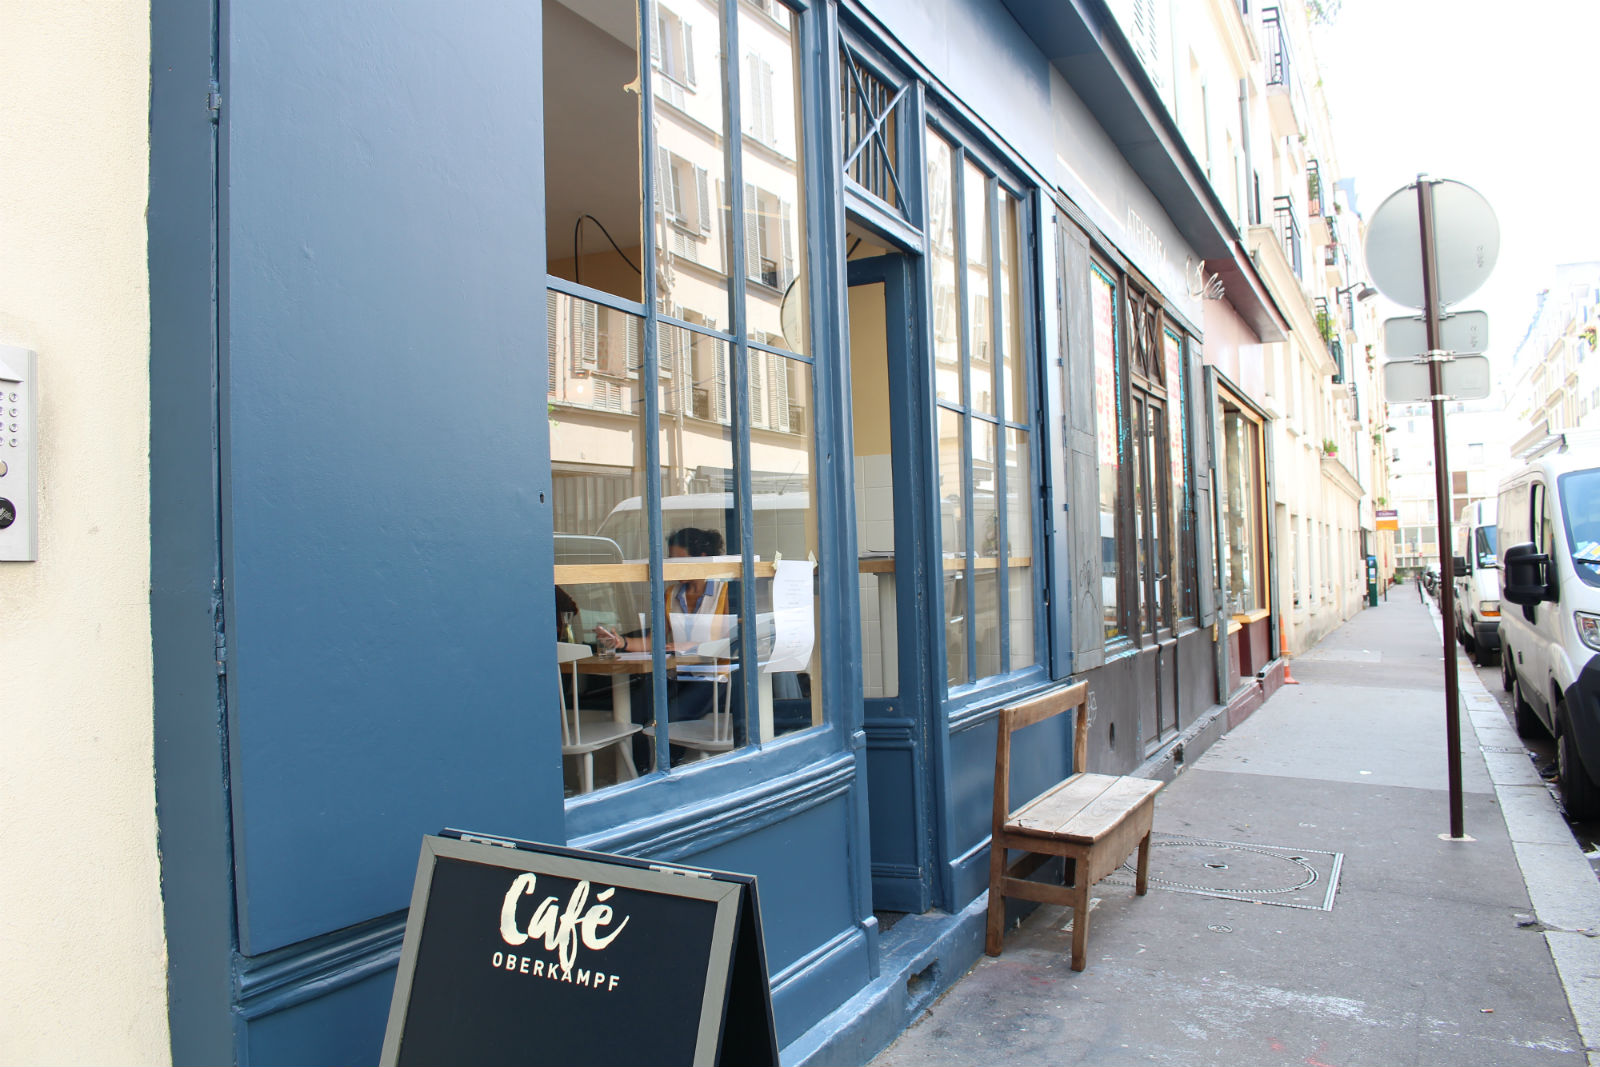 HiP Paris blog. Cafe Oberkampf. Location on rue Neuve Popincourt.